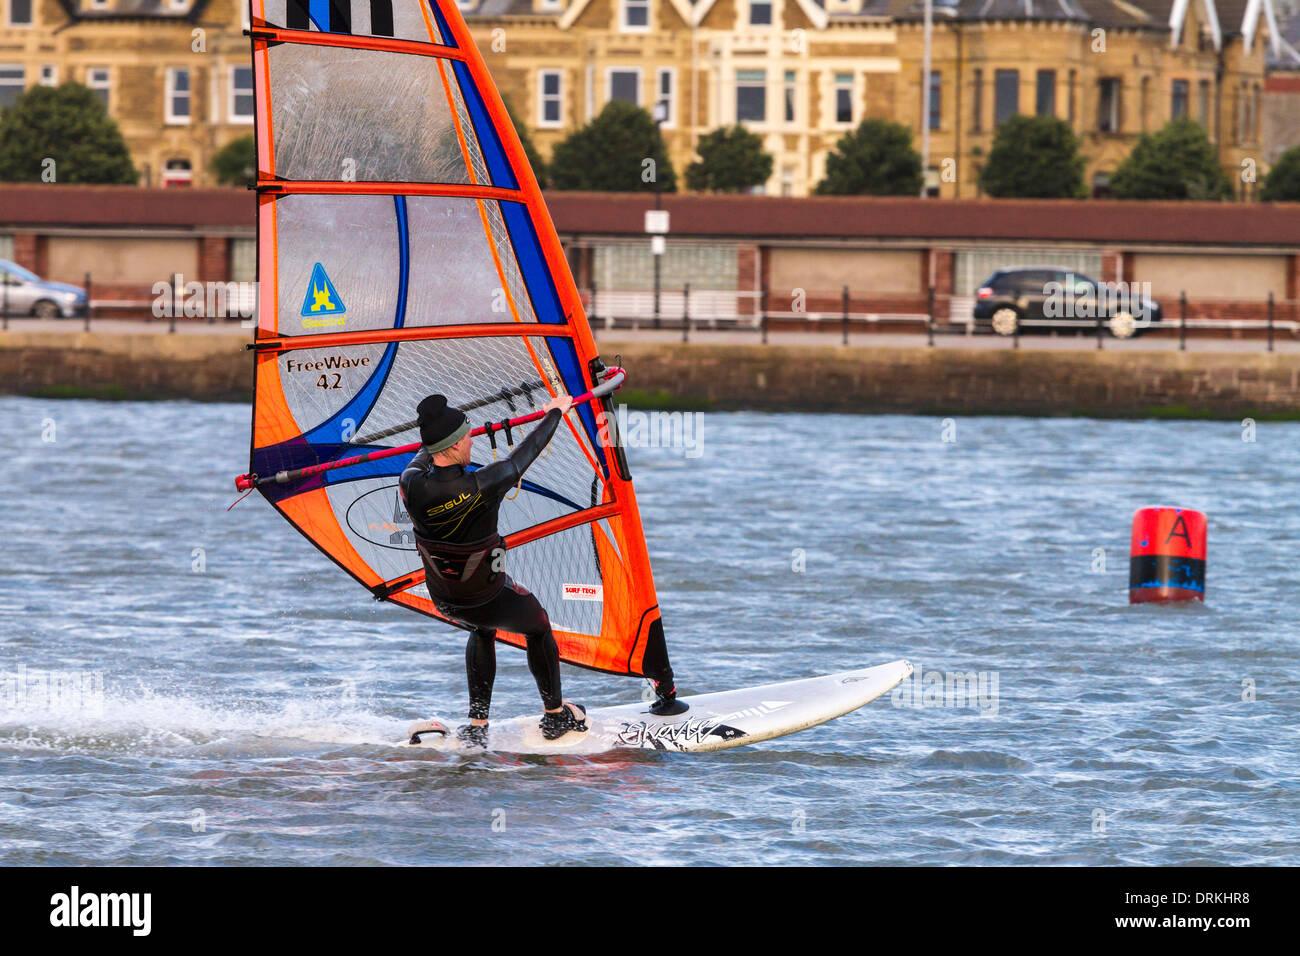 Male windsurfer sails on marine lake - Stock Image